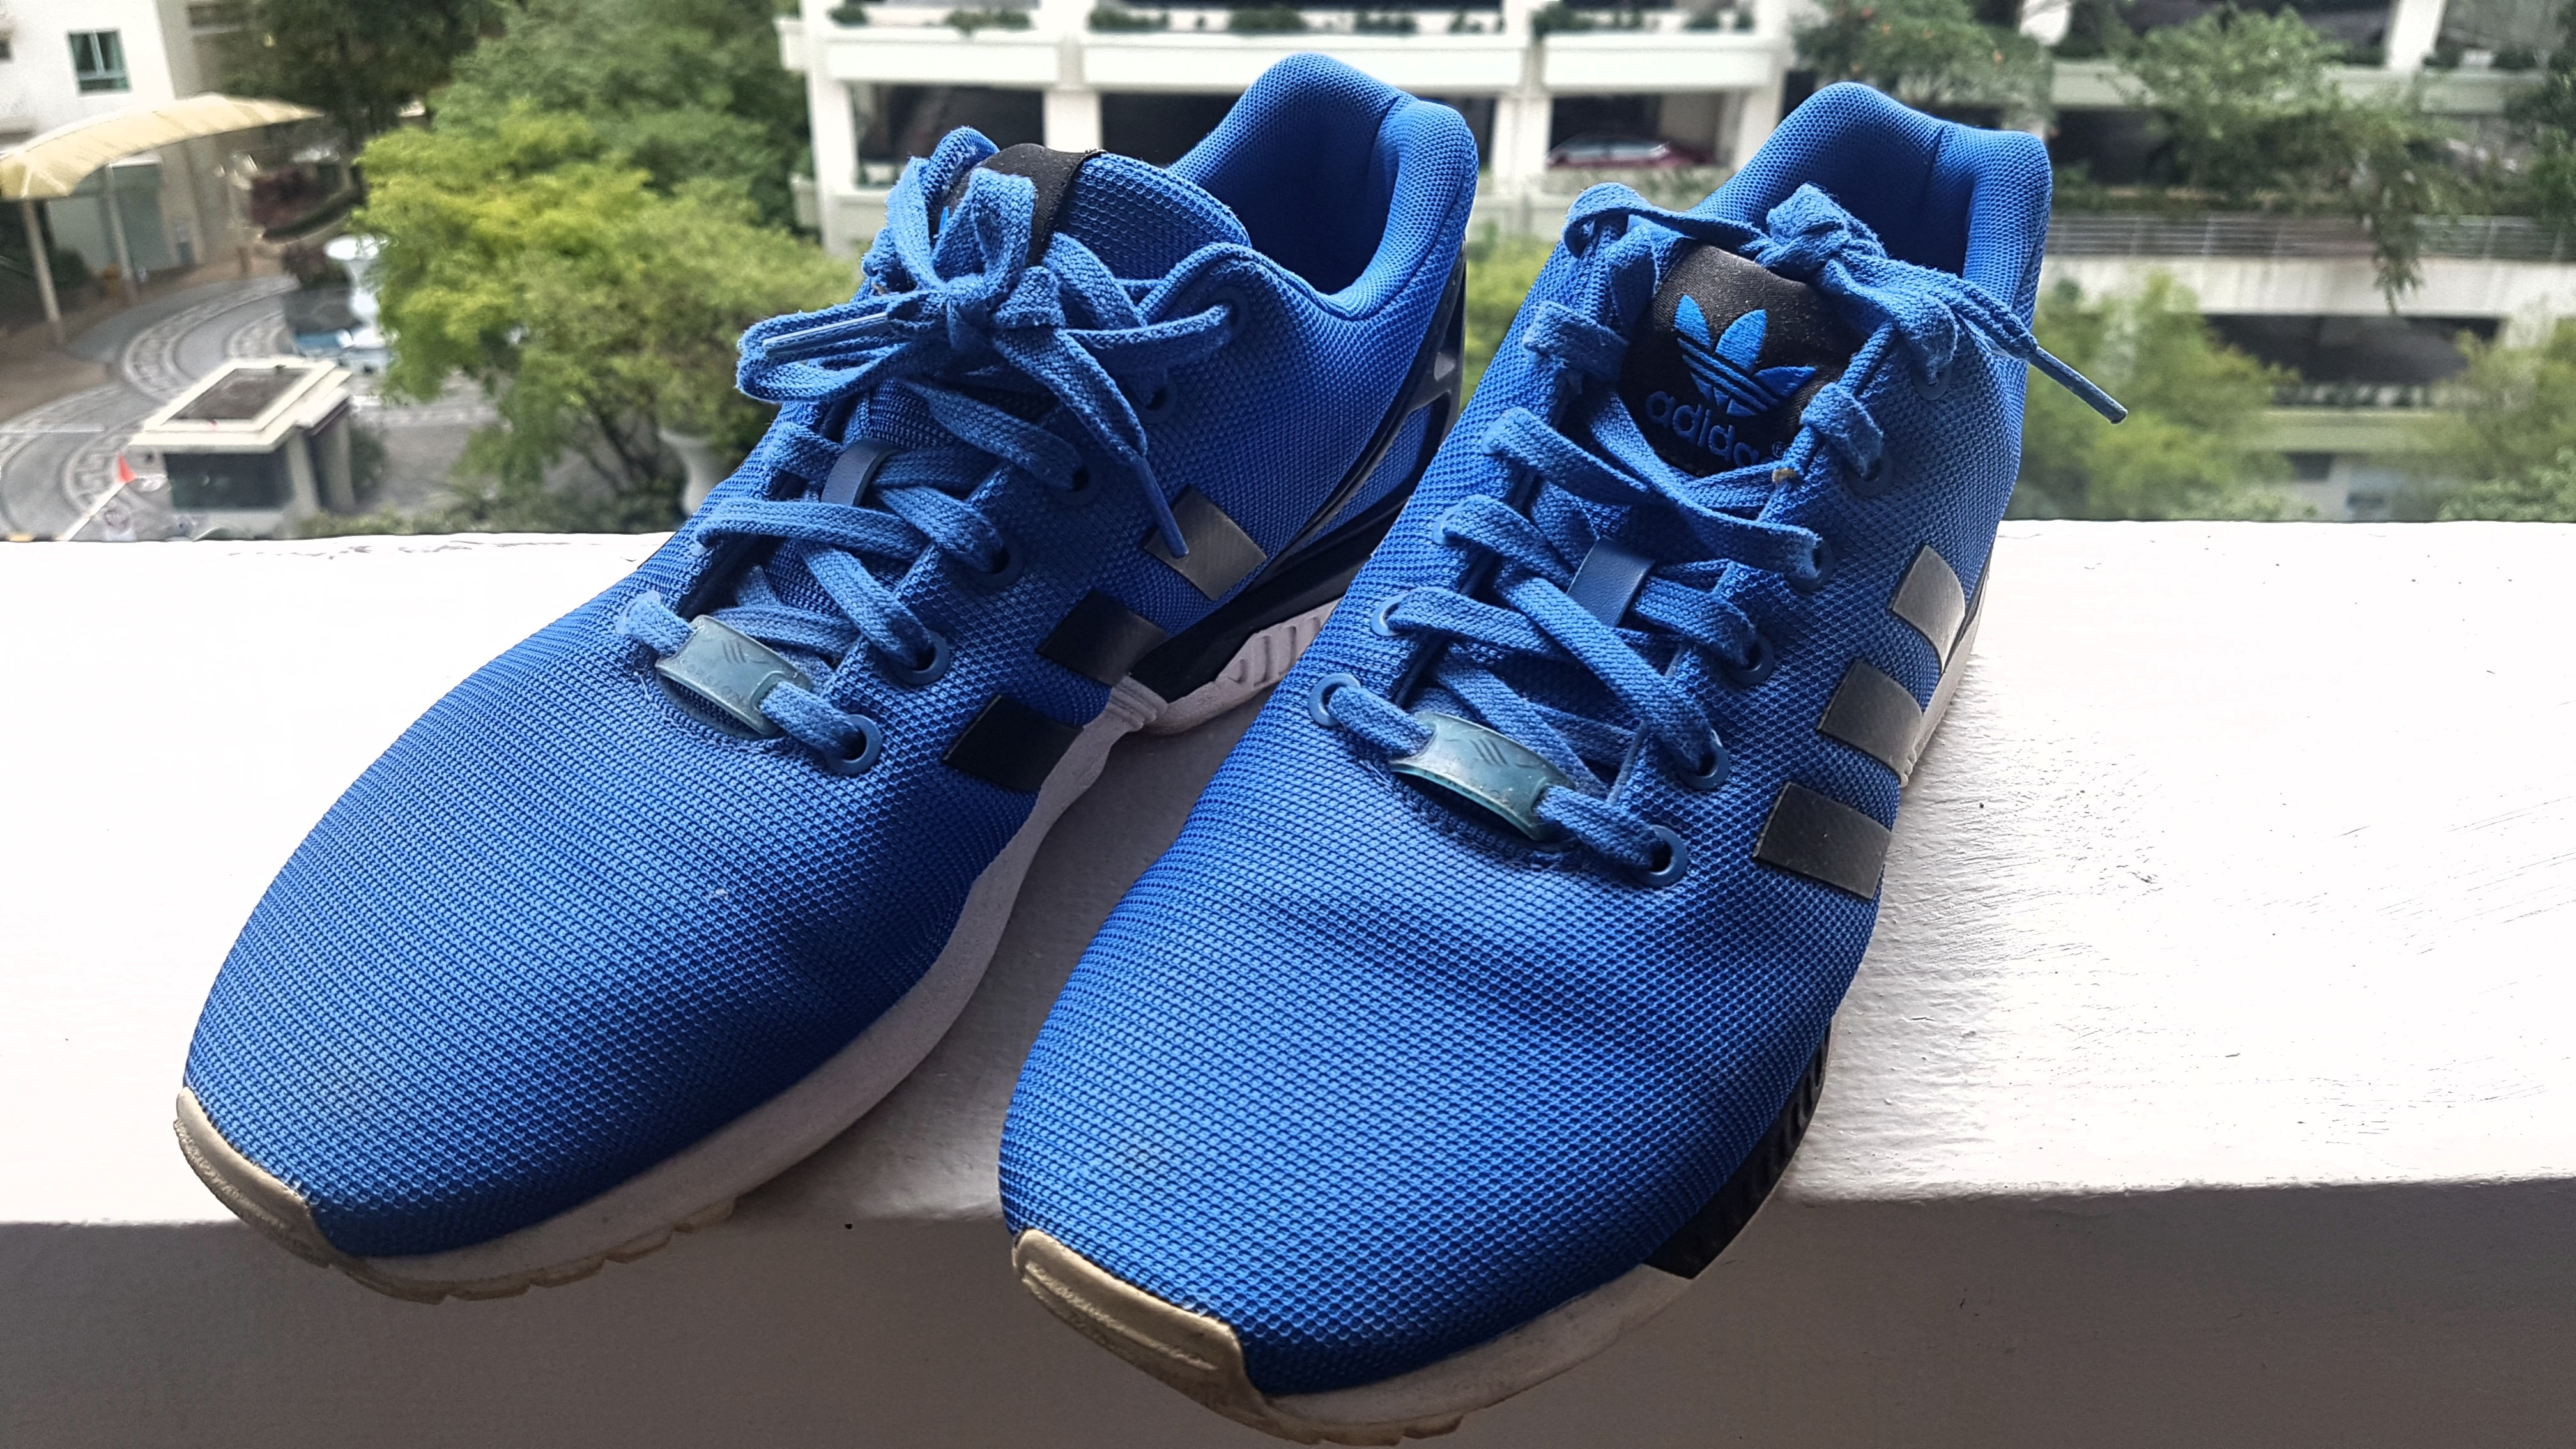 watch ccde2 f6b6f Home · Men s Fashion · Footwear · Sneakers. photo photo ...